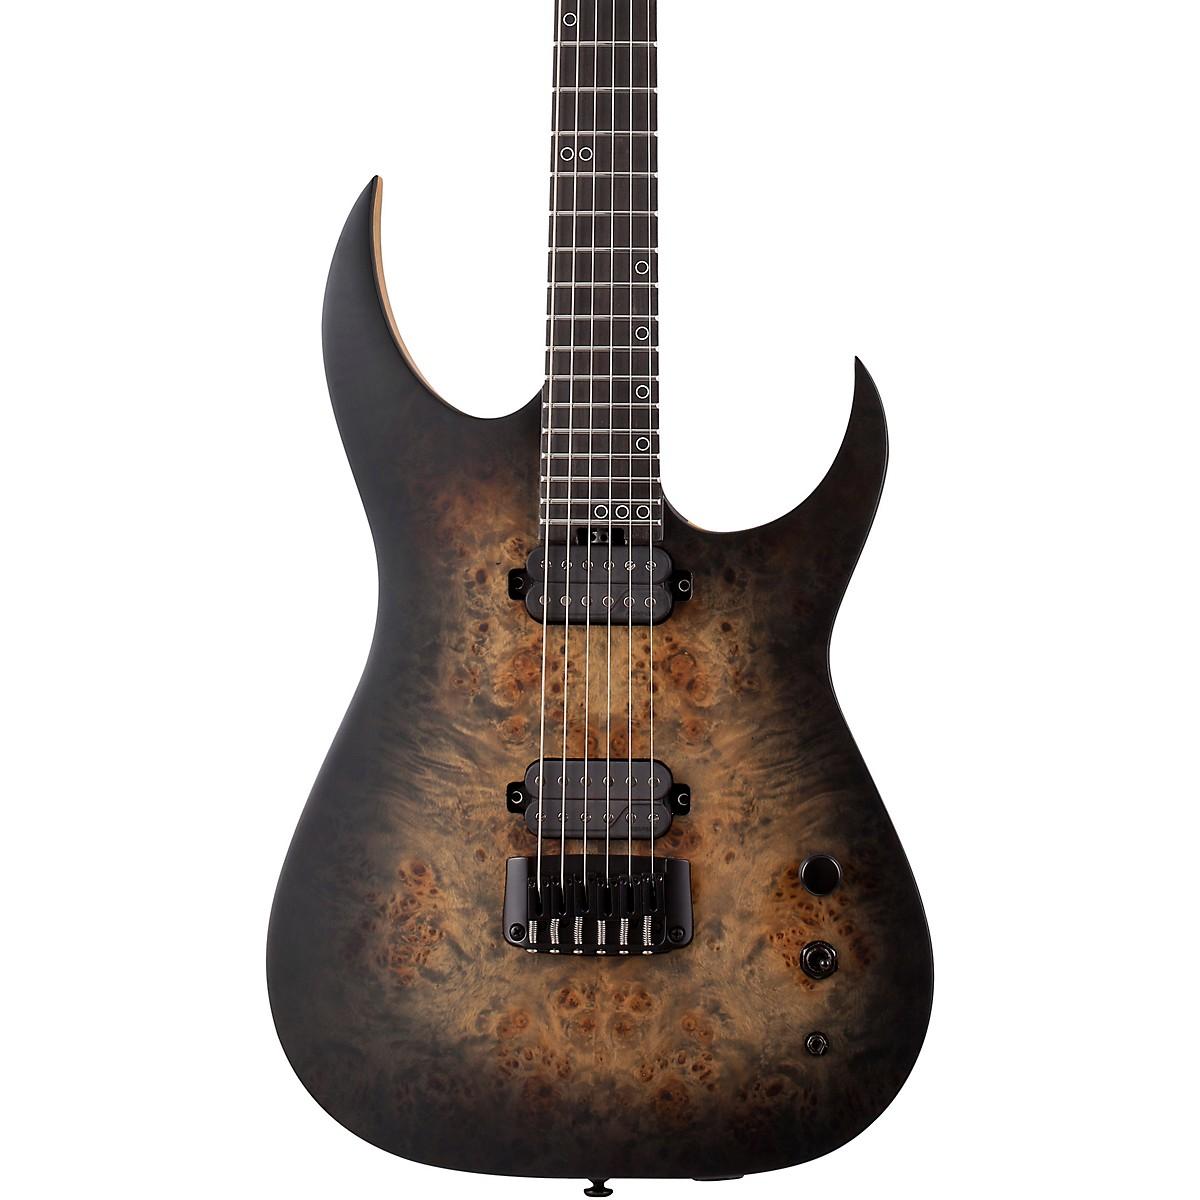 Schecter Guitar Research KM-6 MK-III Artist Electric Guitar